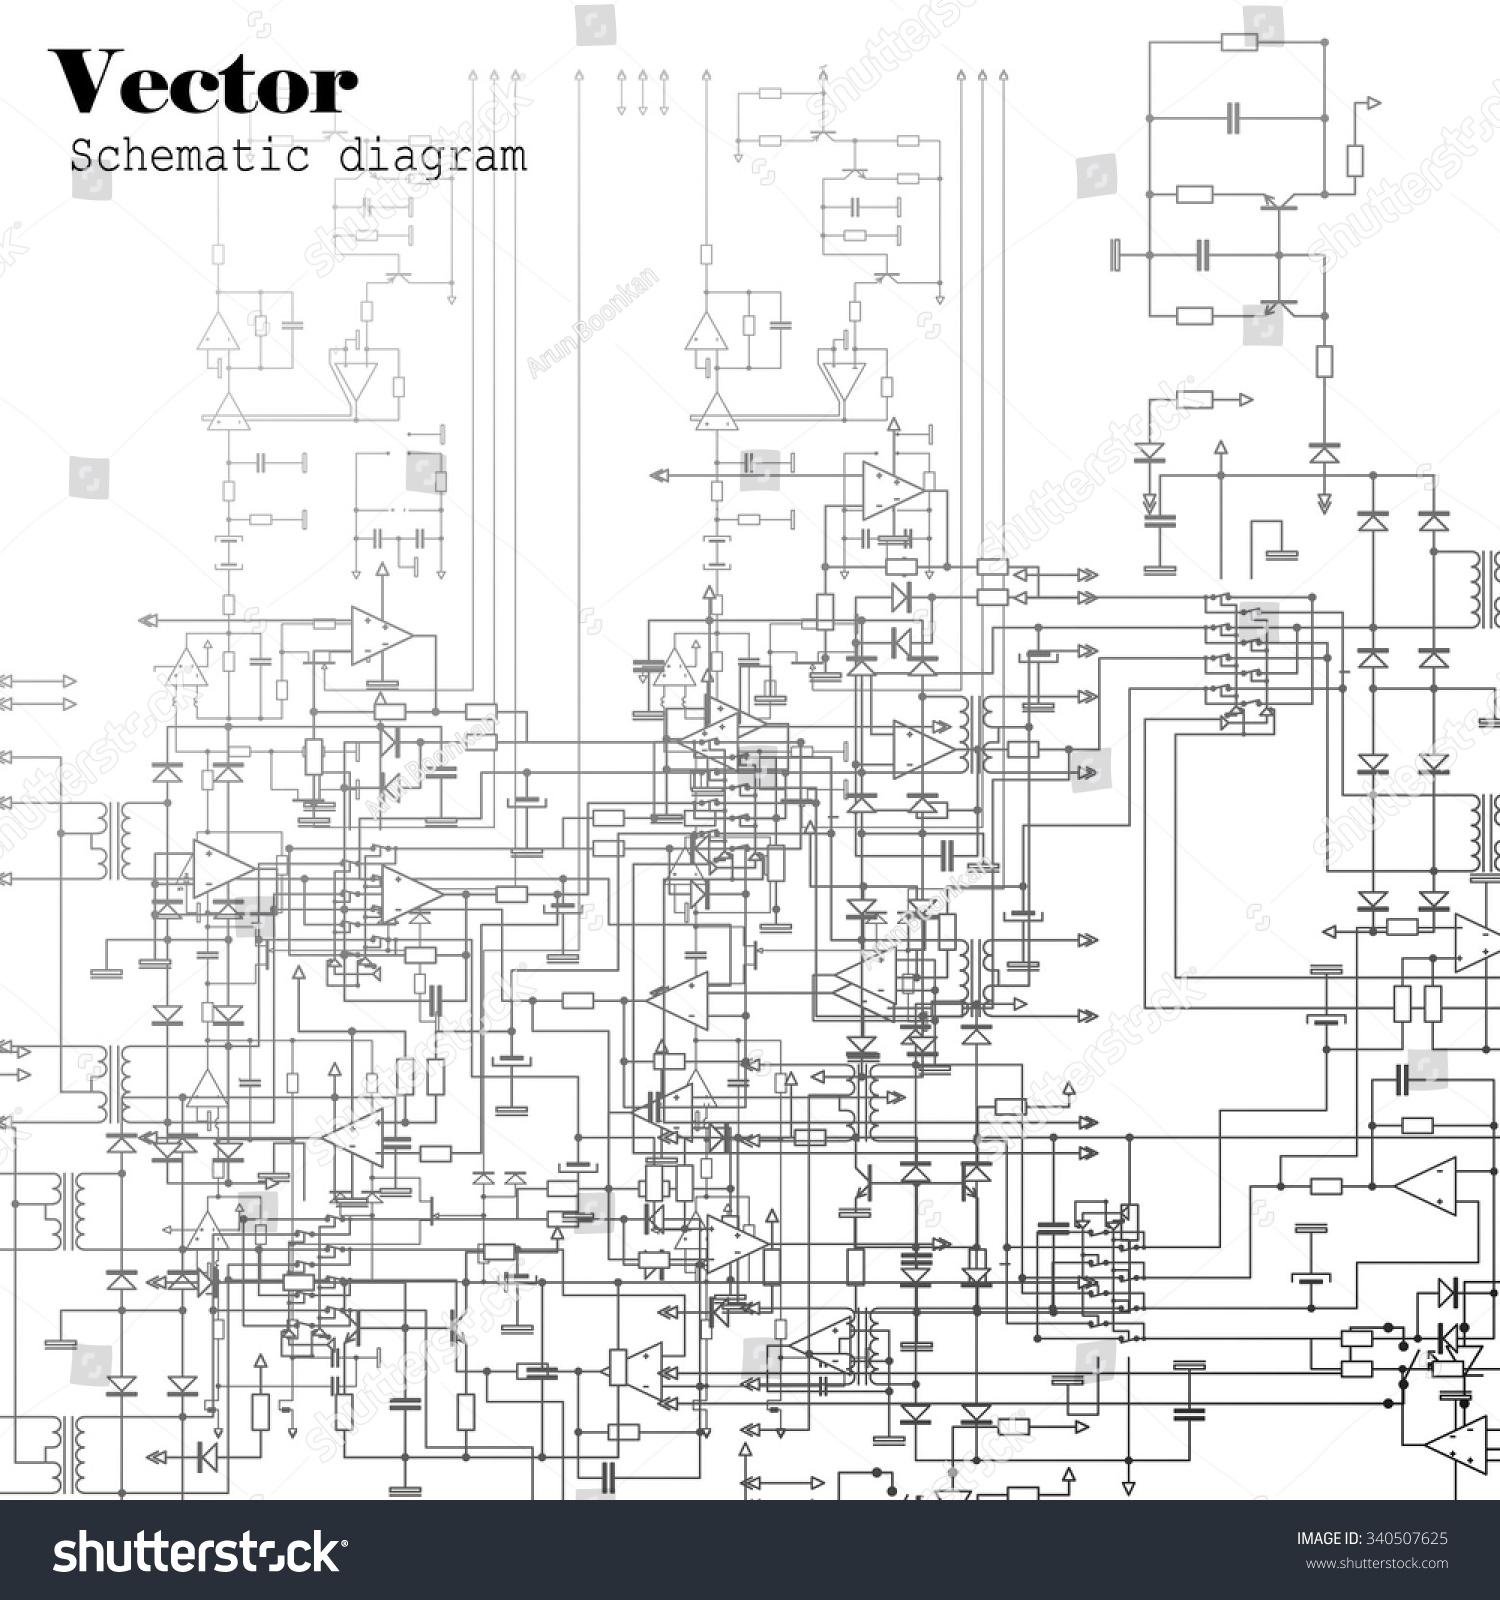 schematic diagram stock vector illustration 340507625. Black Bedroom Furniture Sets. Home Design Ideas